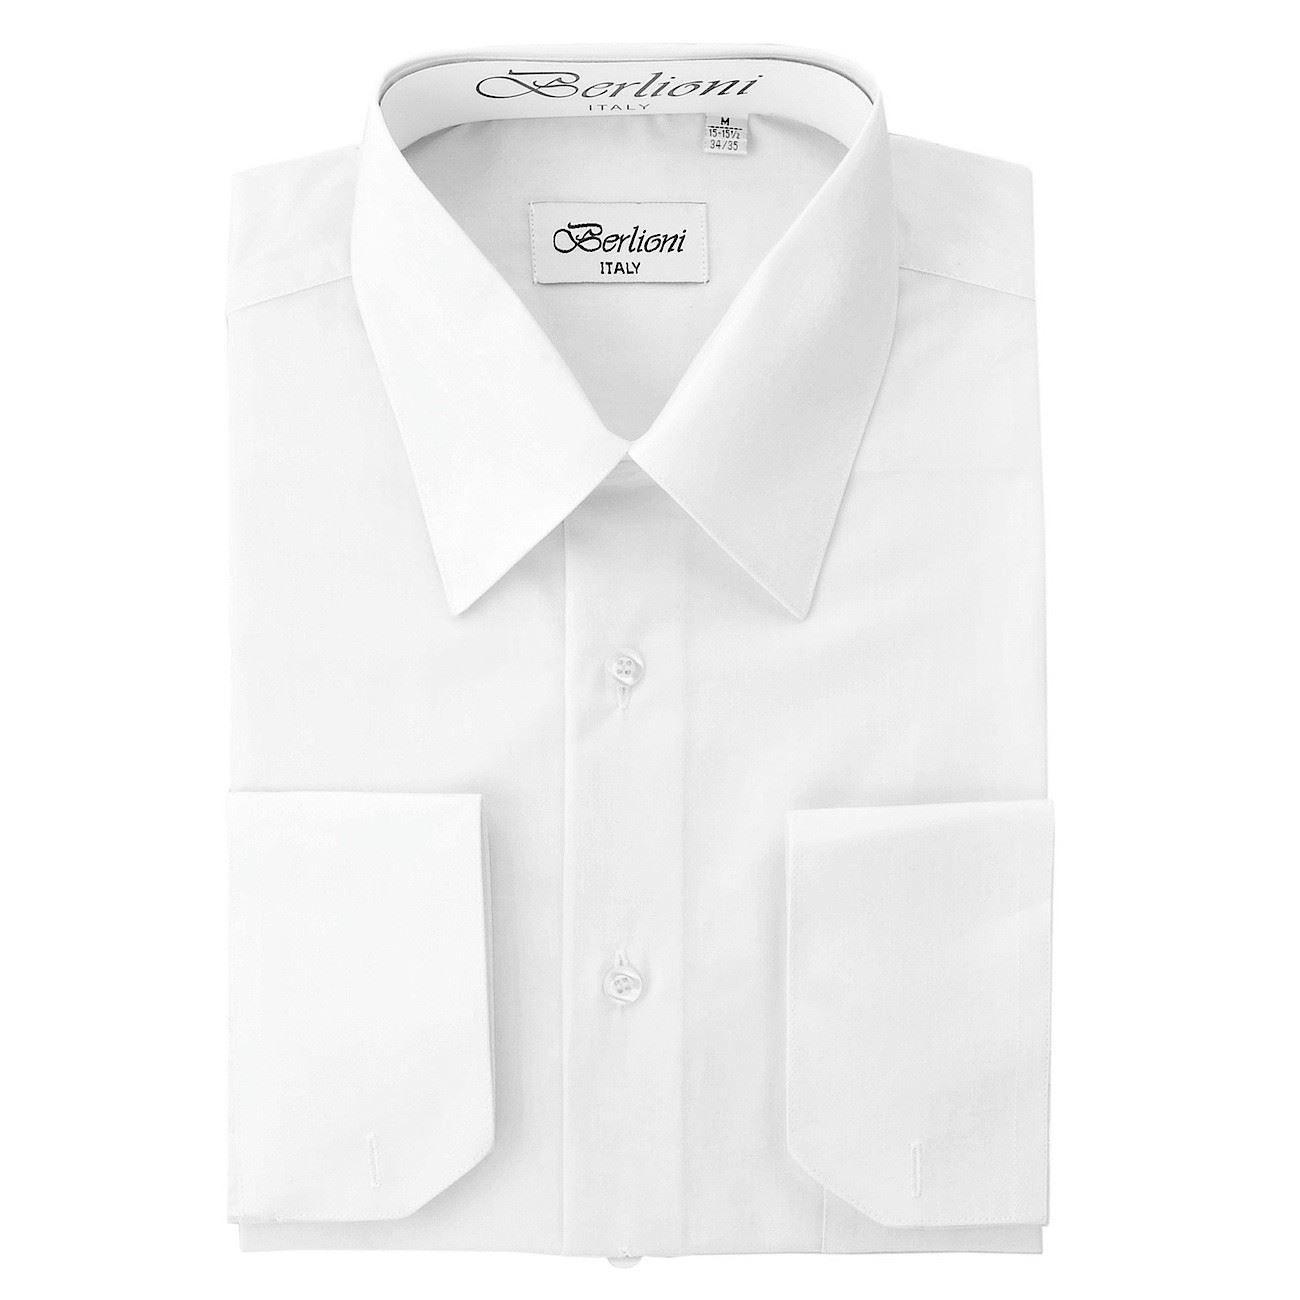 d1eb8a40ff8 Berlioni Italy Men s Dress Shirt French Convertible Cuff Long Sleeve Snow  White